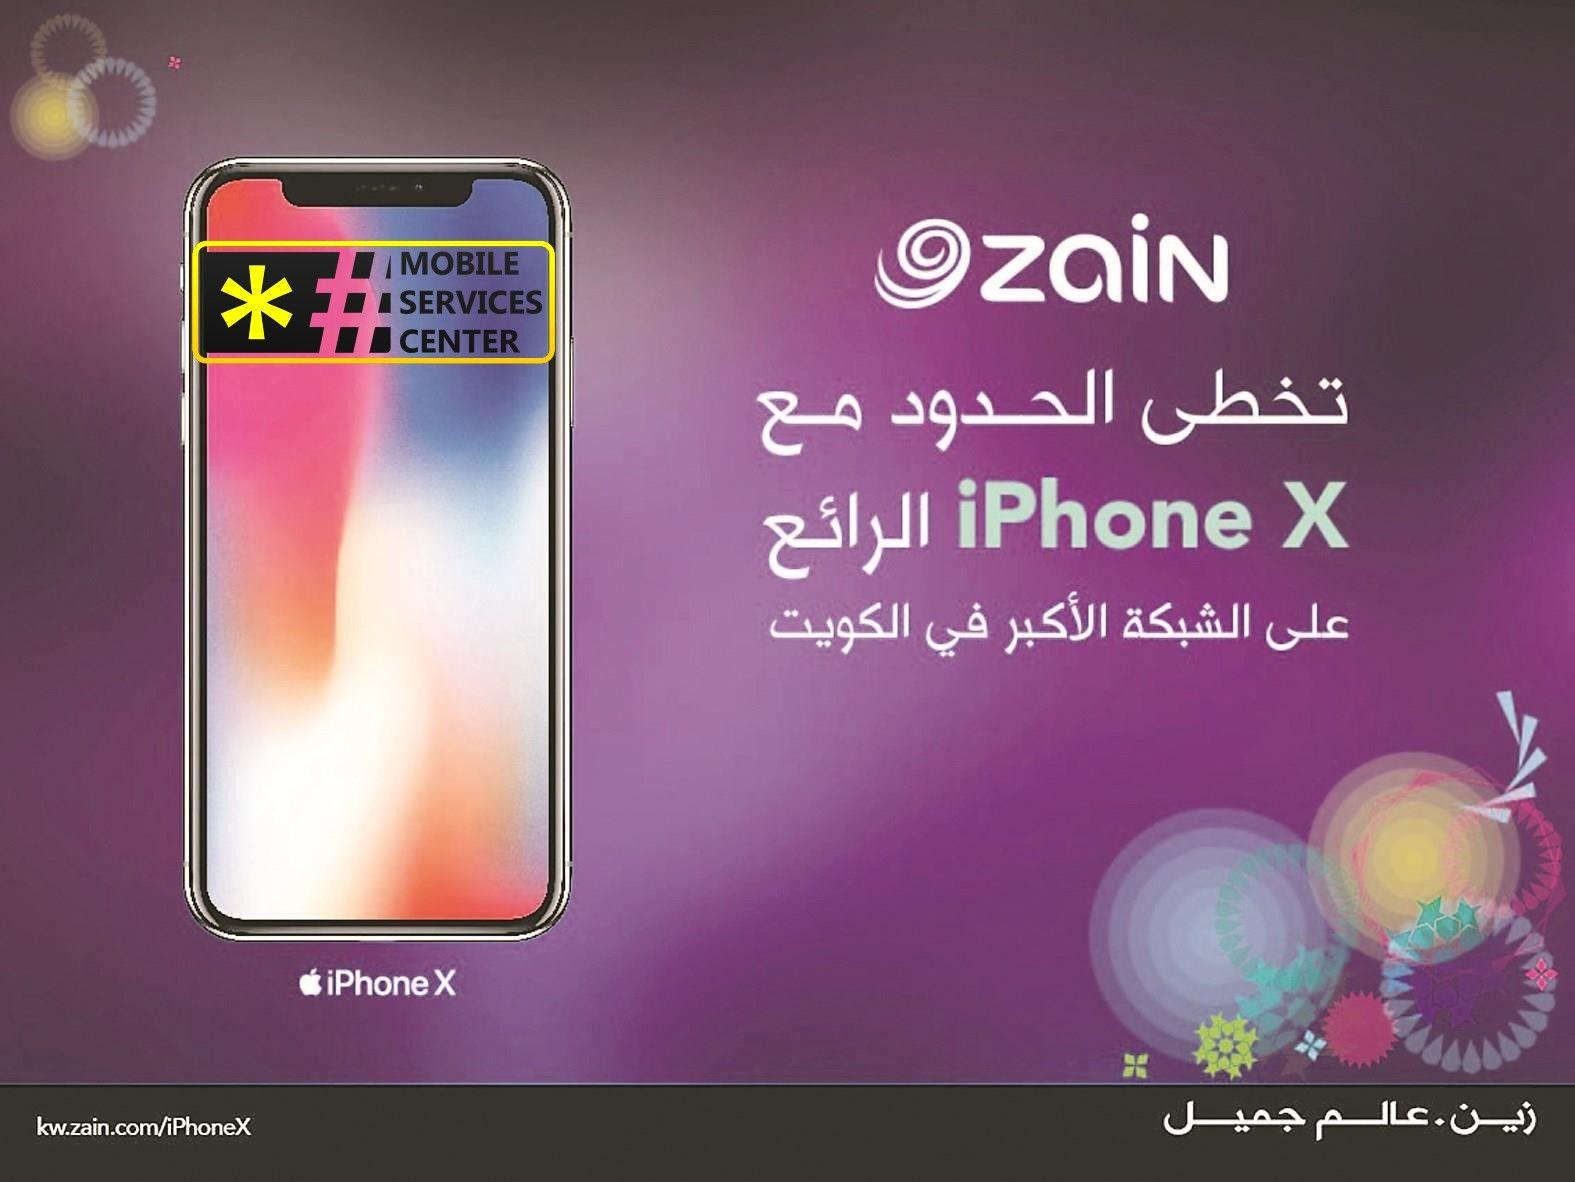 زين الكويت Iphone Phone Electronic Products